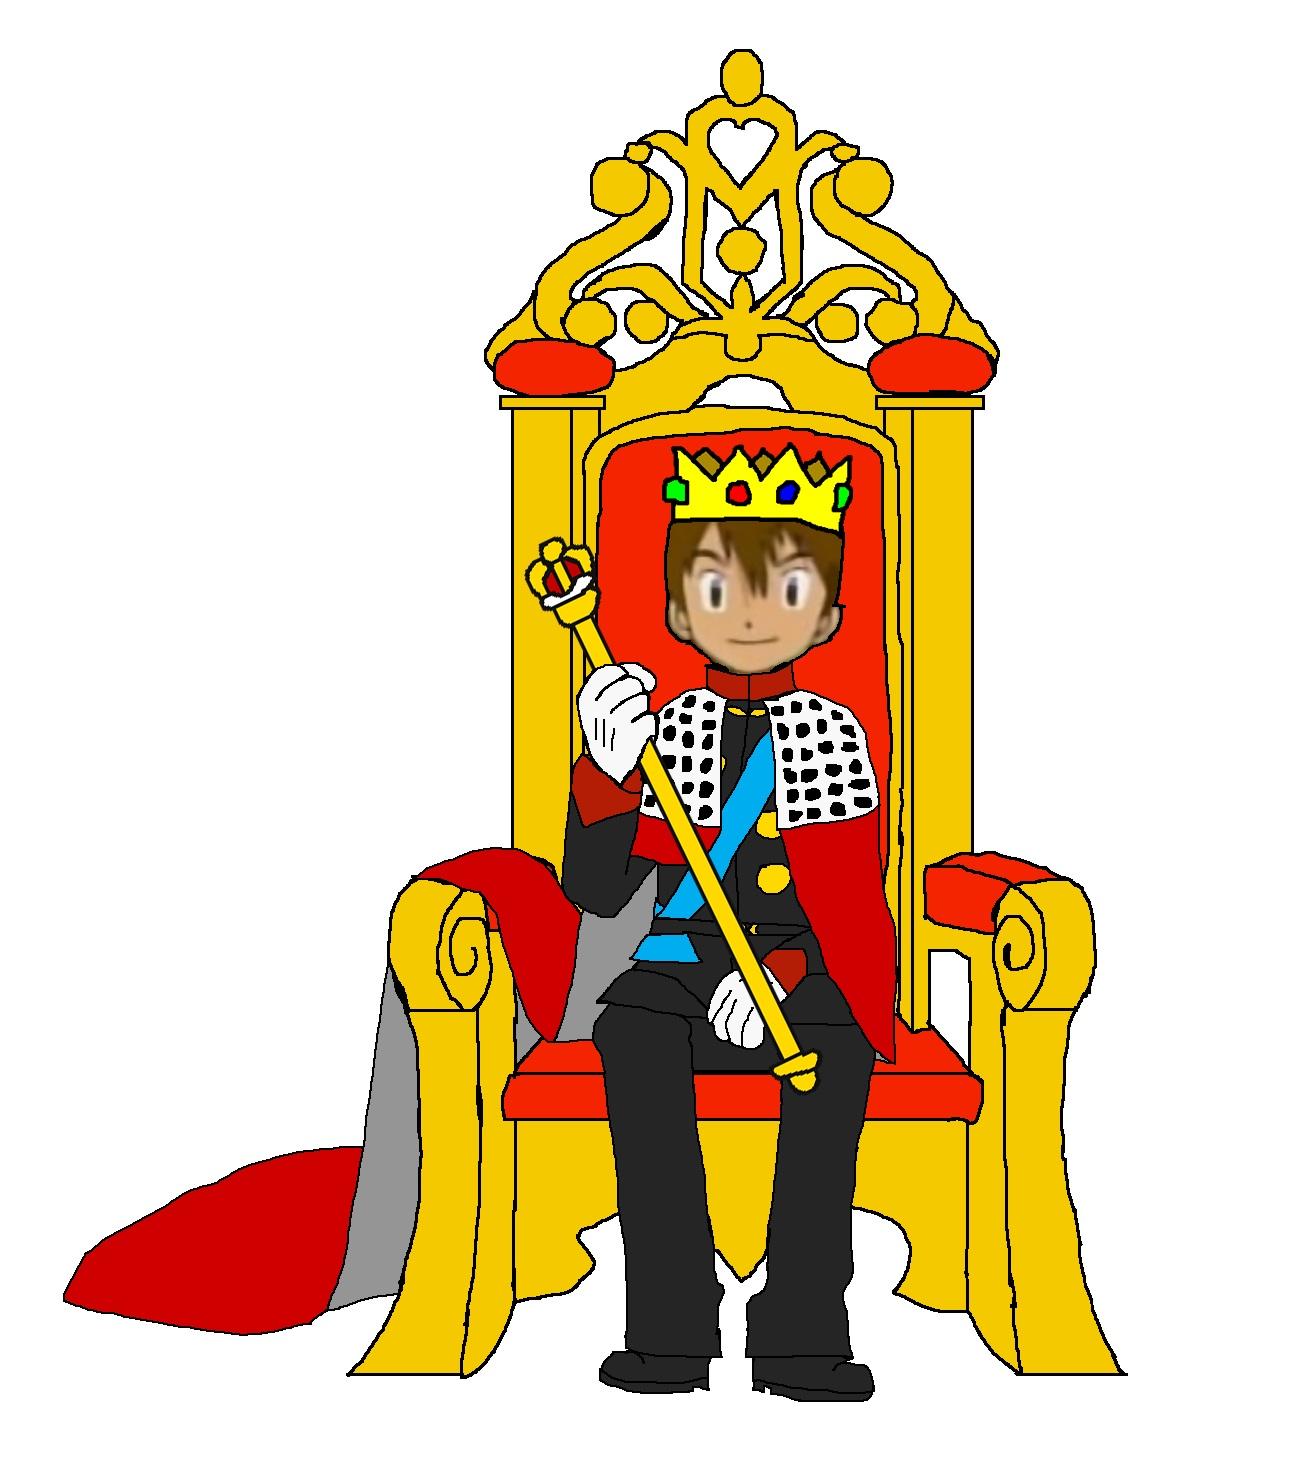 King Tai - Throne by KingLeonLionheart on DeviantArt